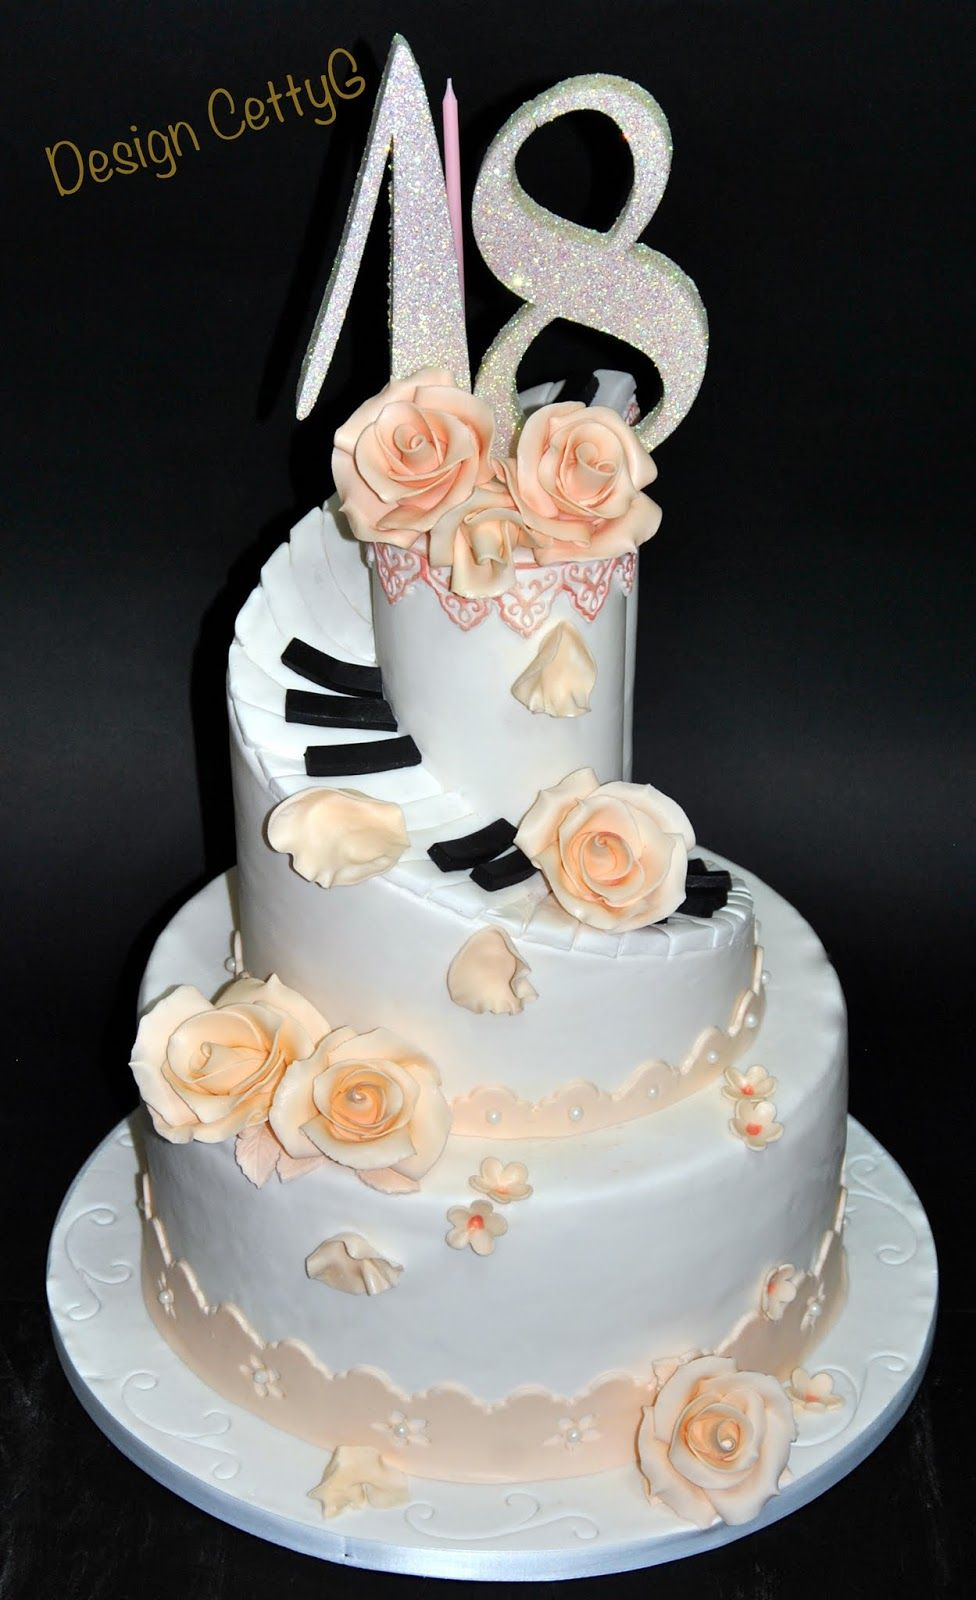 Le torte decorate di cettyg 18 anni cakes - Torte salate decorate ...